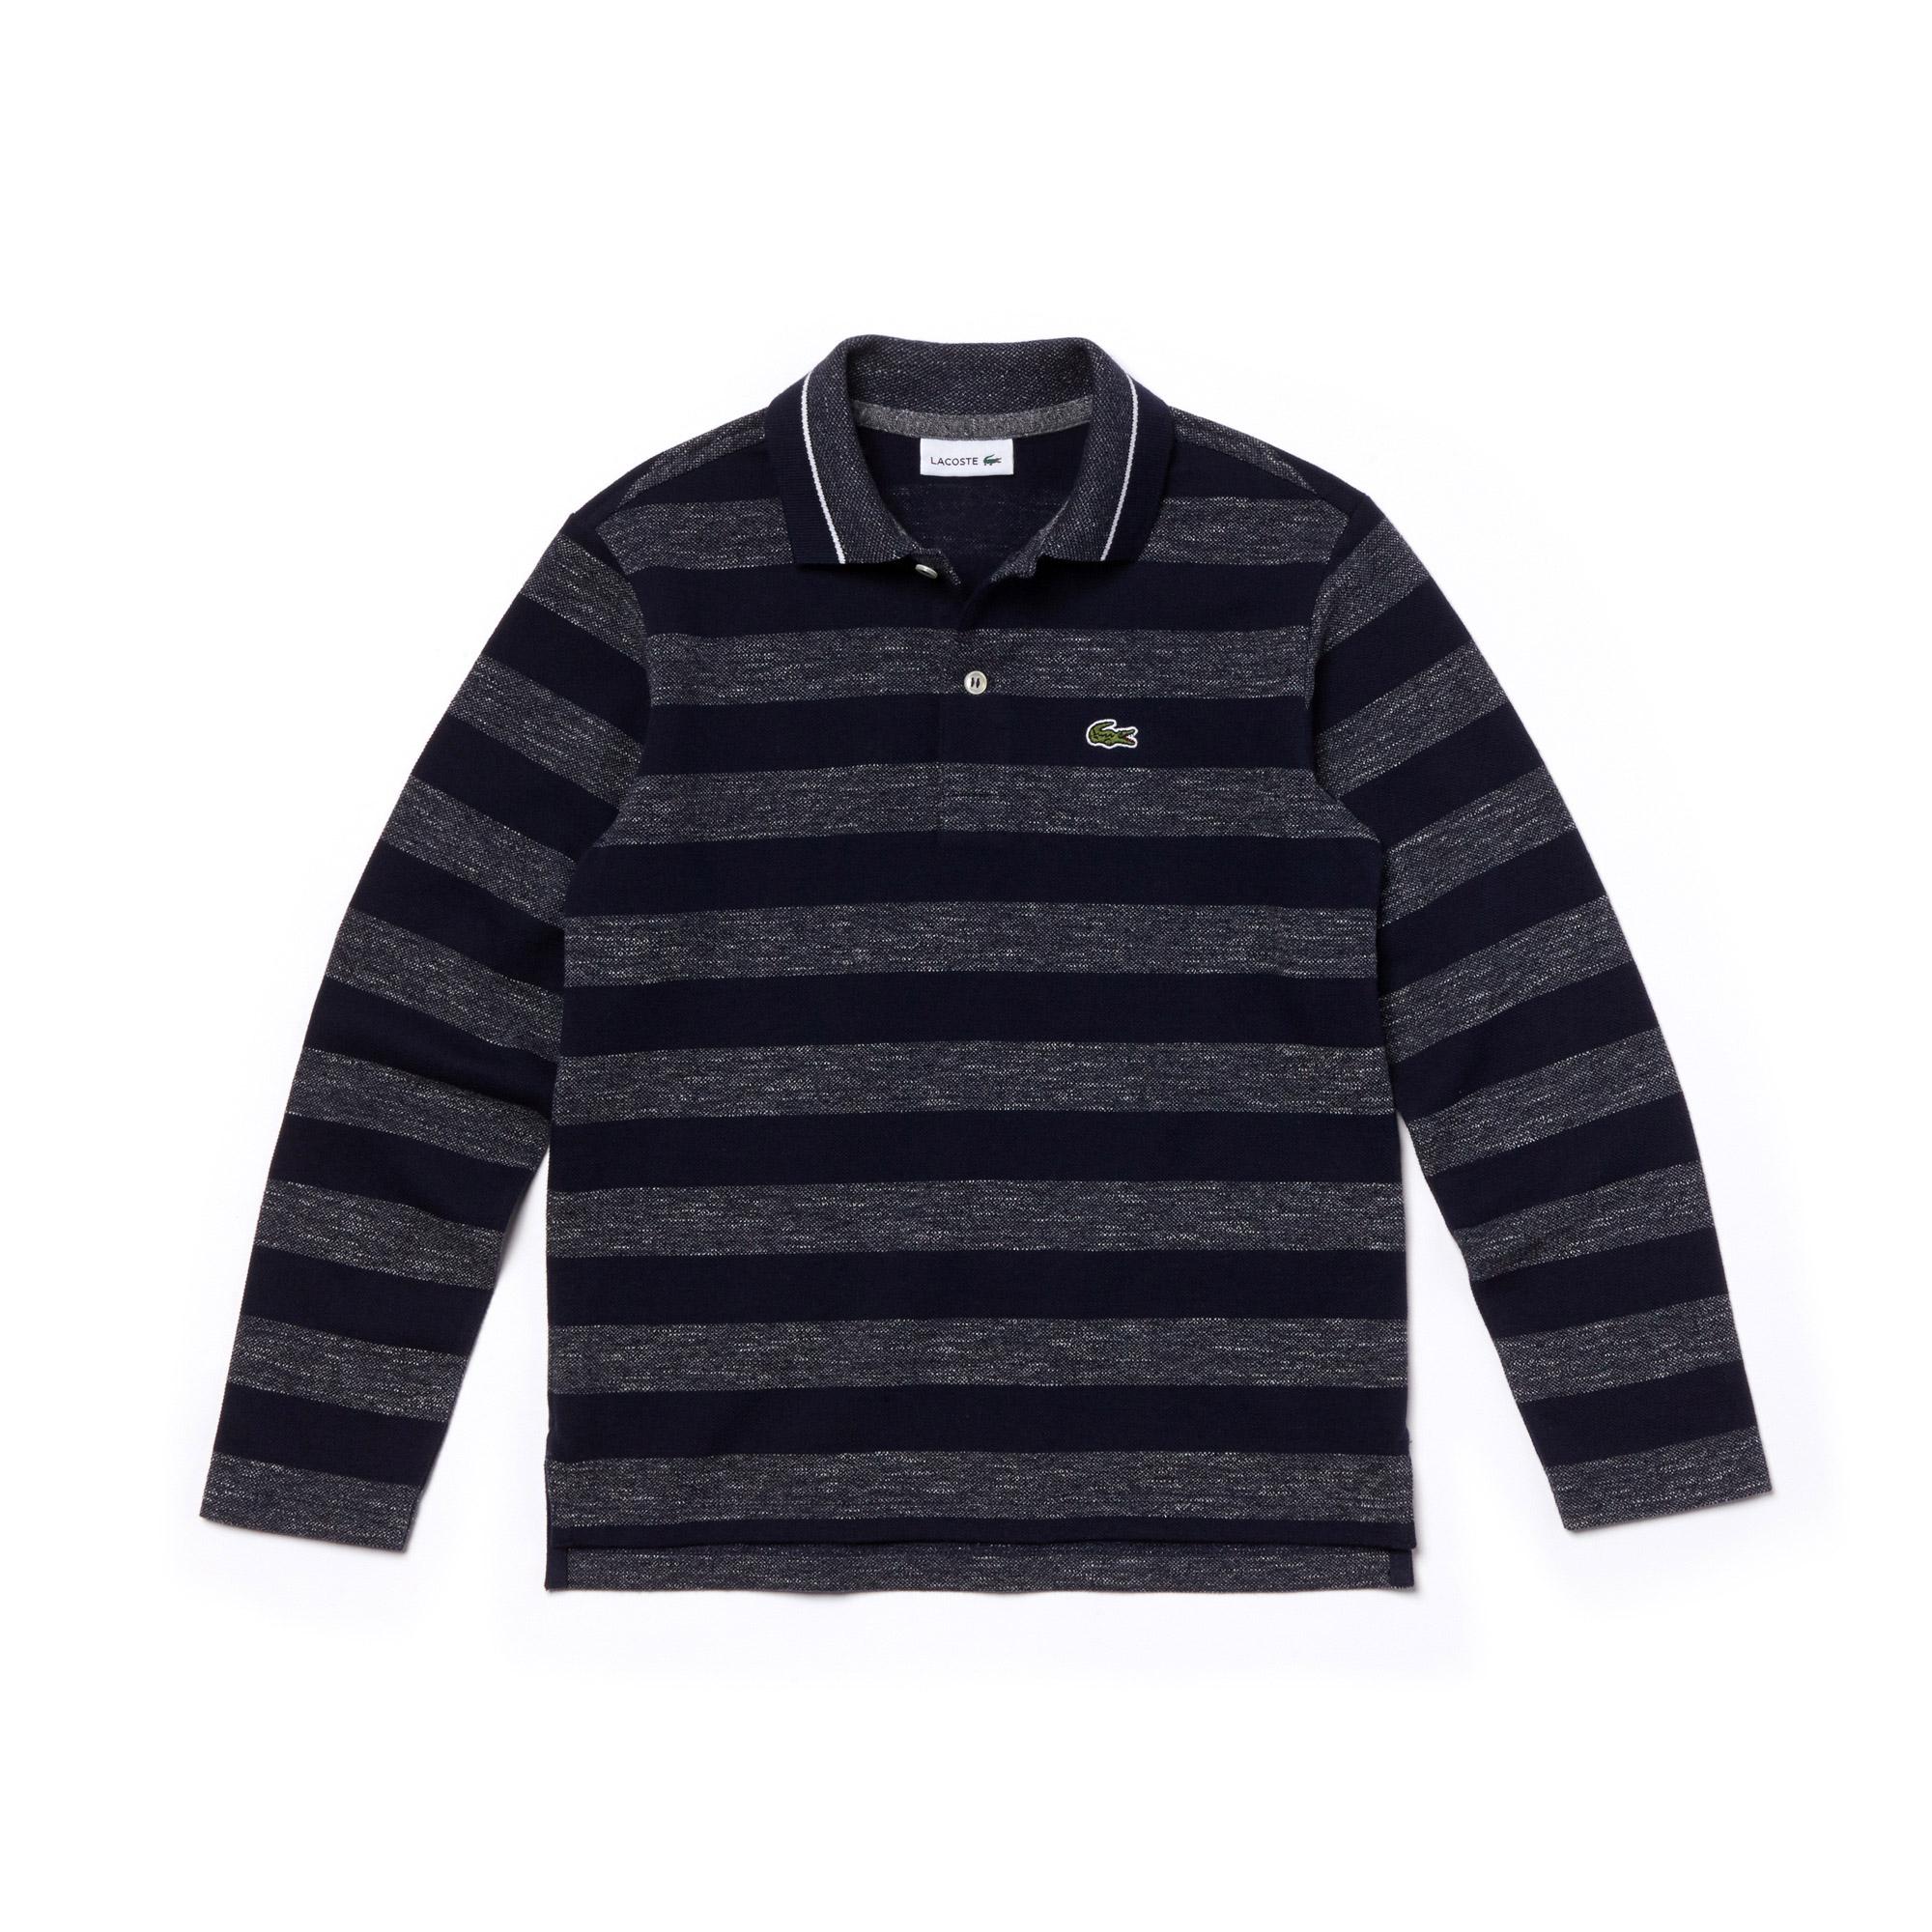 Lacoste Kids' Long Sleeve Polo